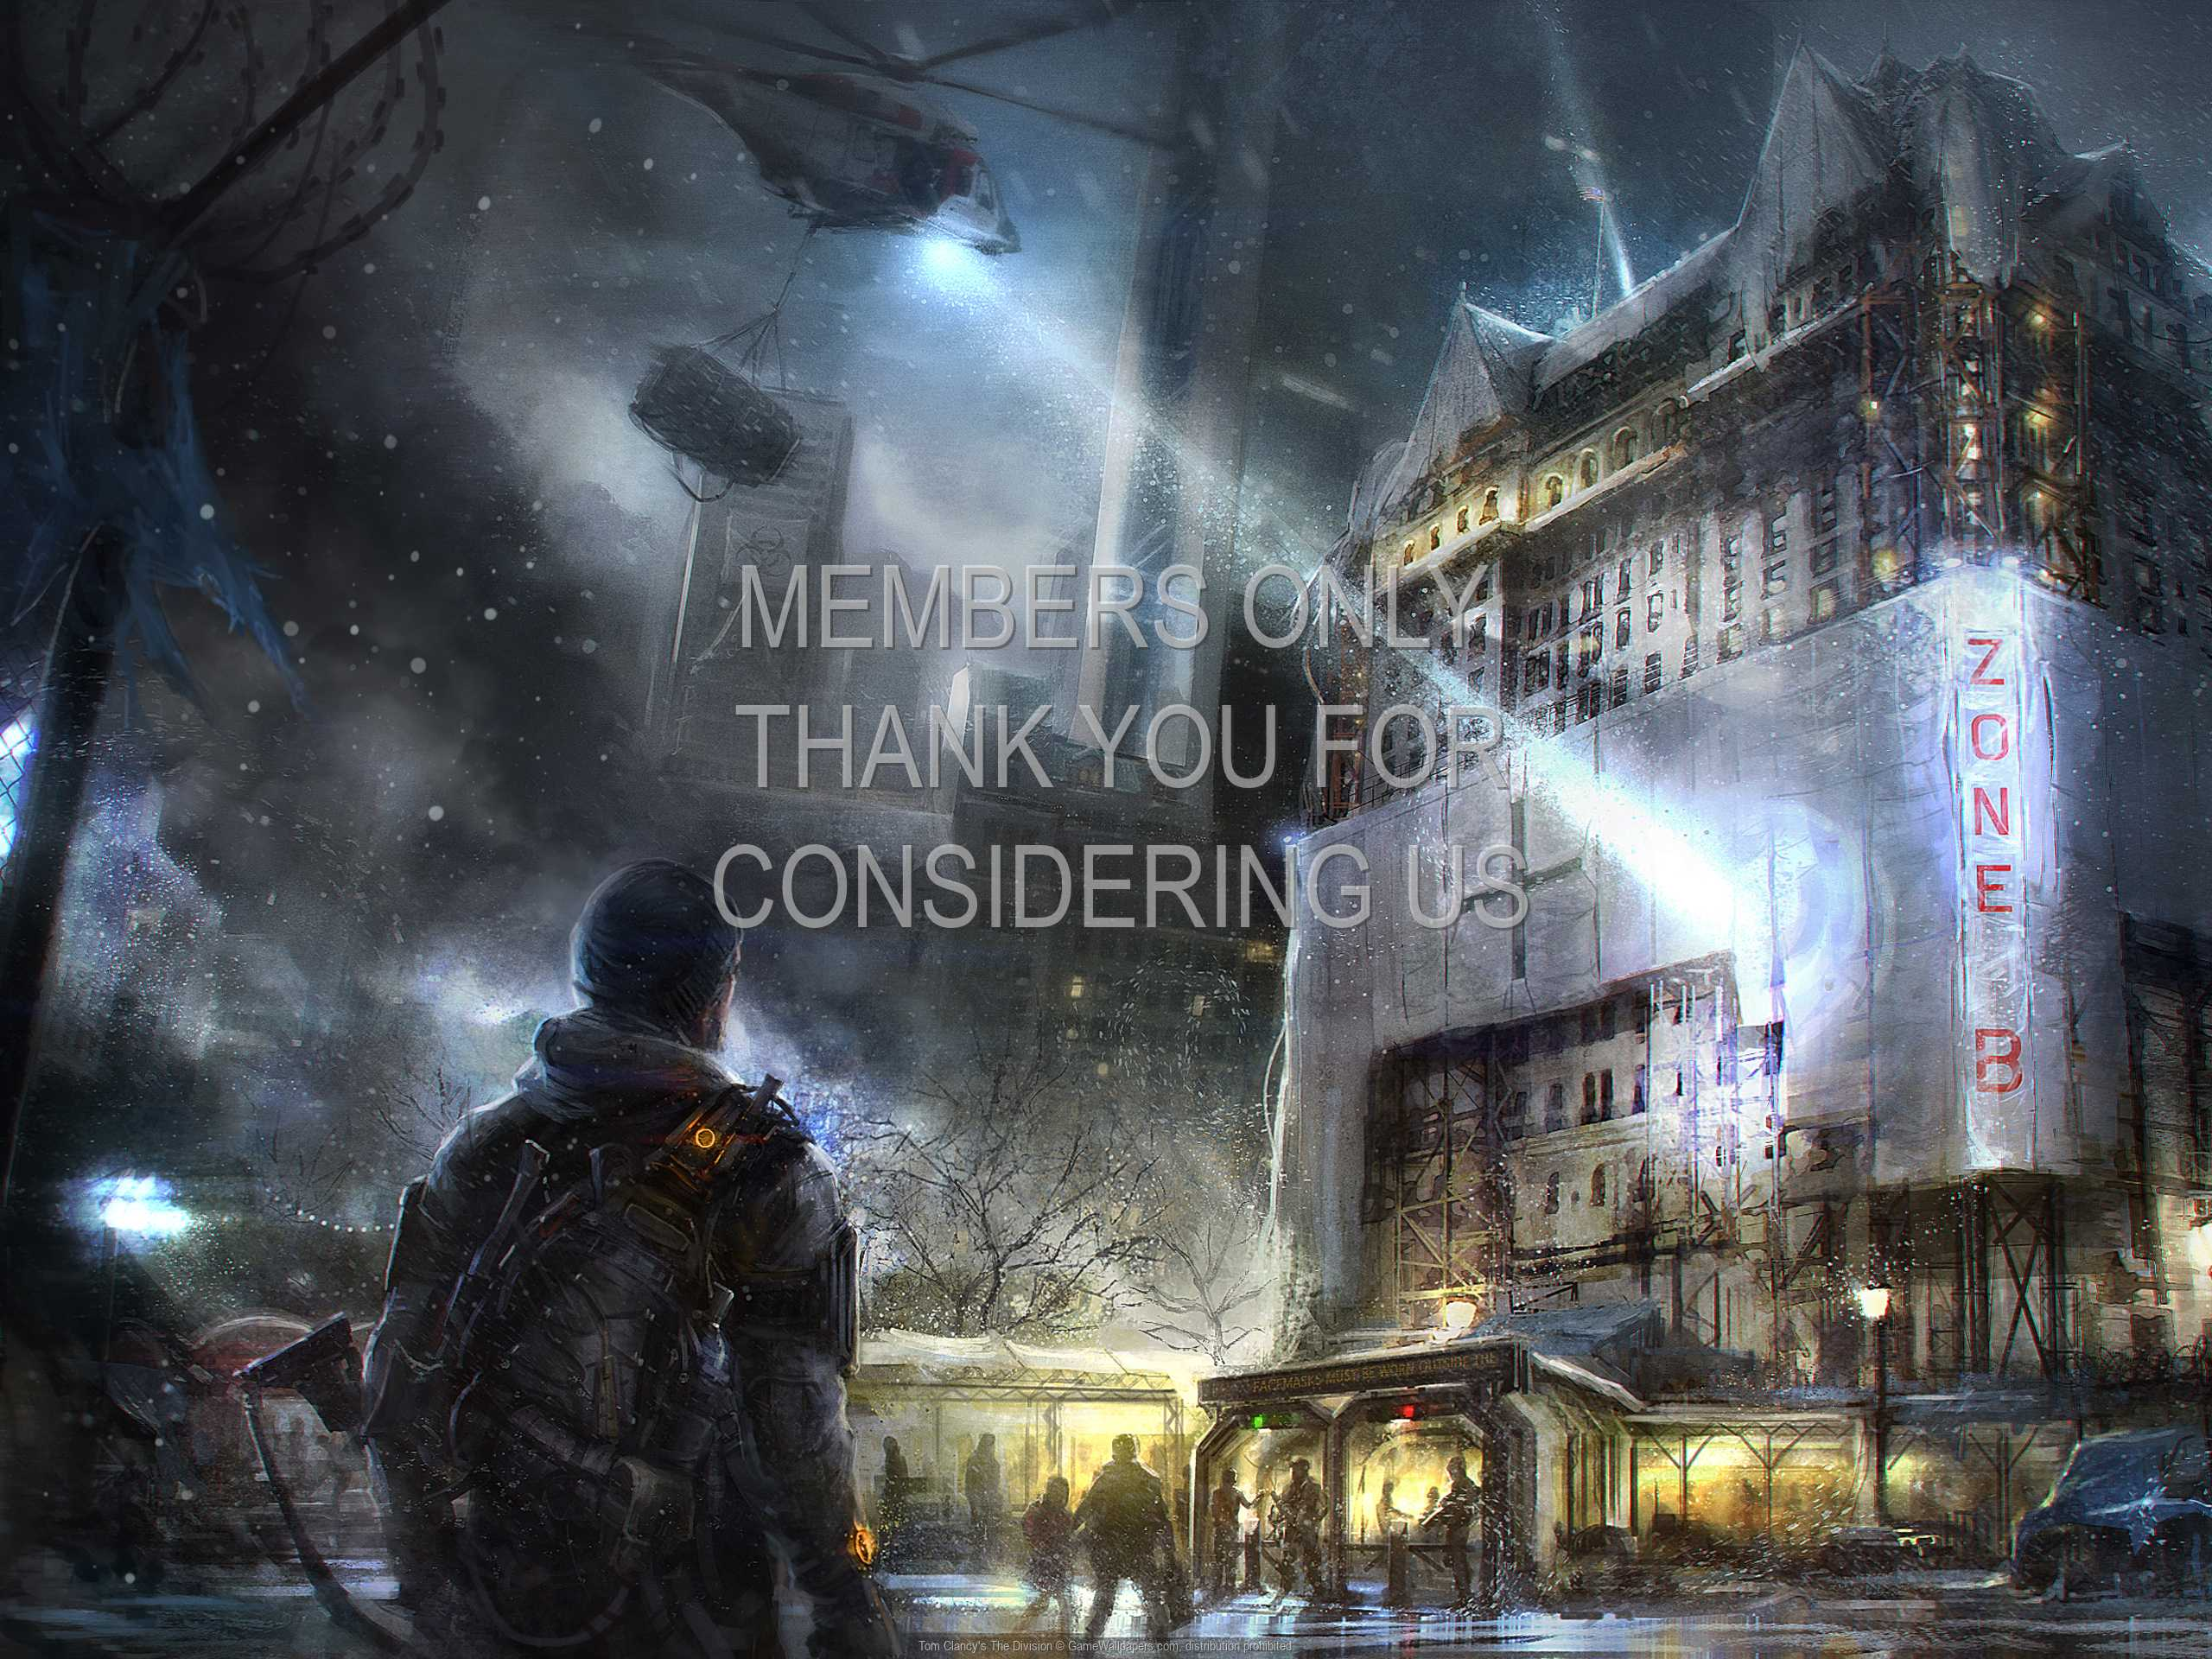 Tom Clancy's The Division 1080p Horizontal Handy Hintergrundbild 01